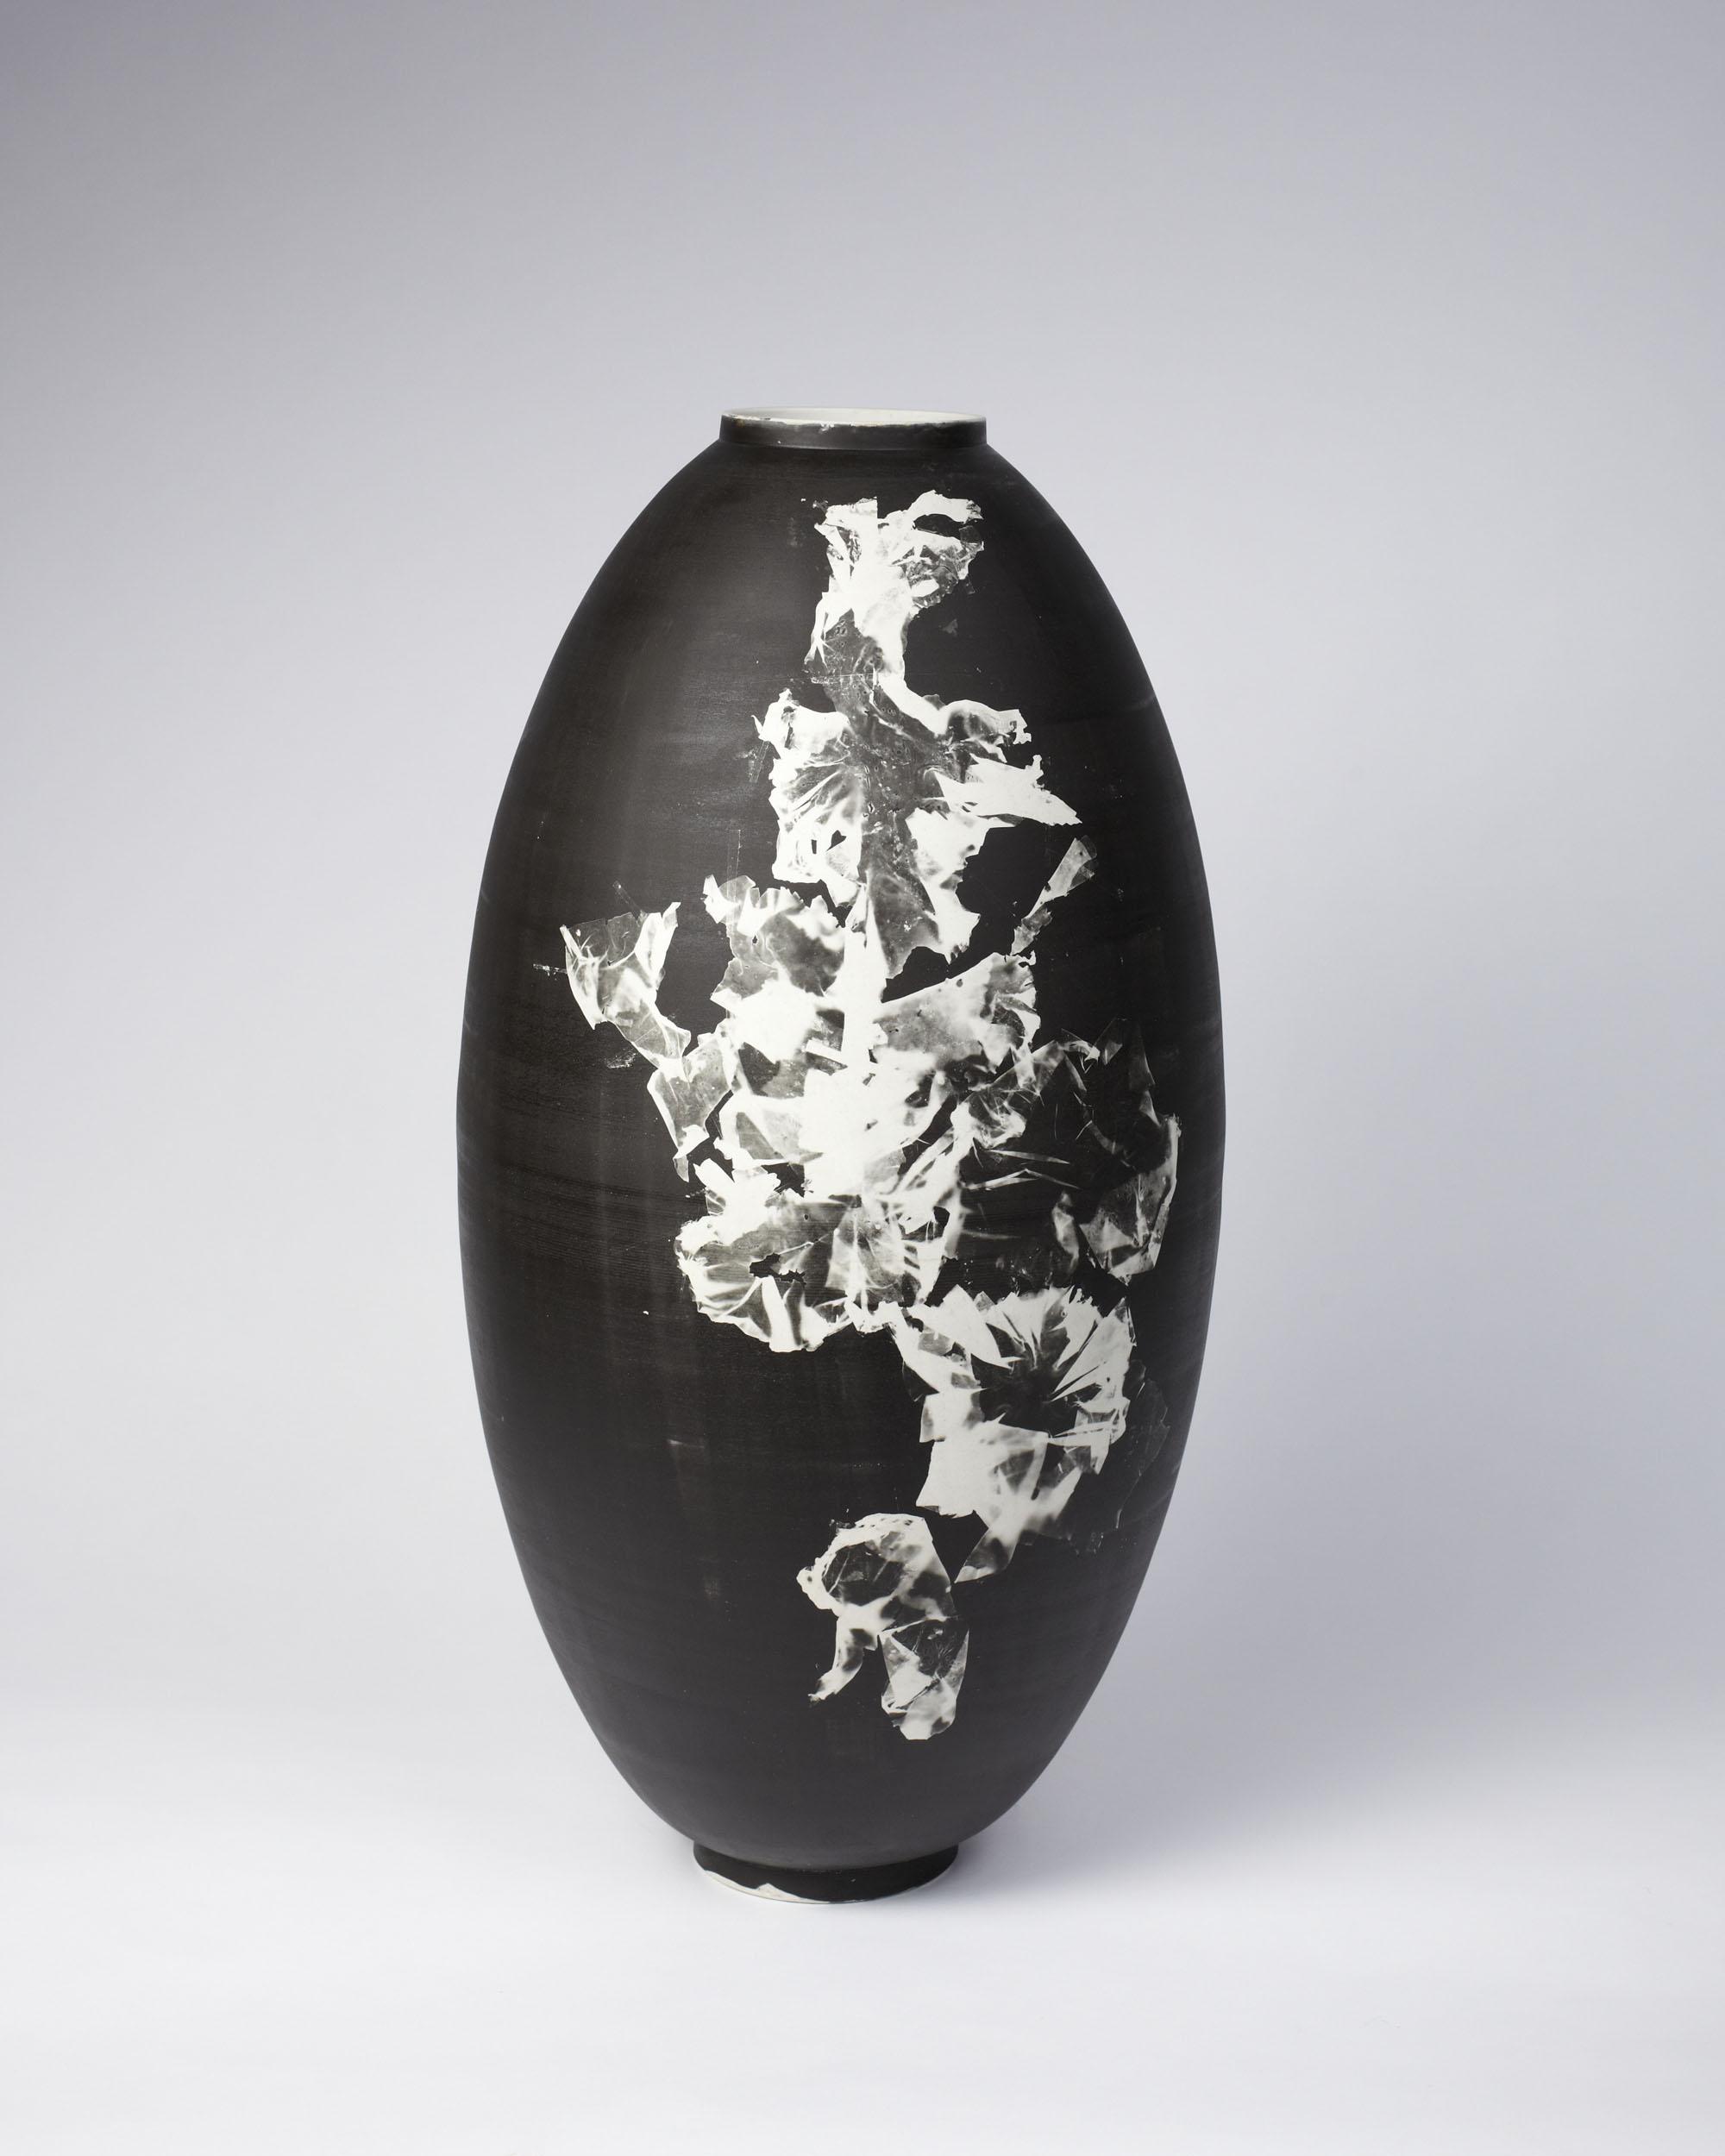 A tall Silverware vase with sea lettuce silver gelatin photogram